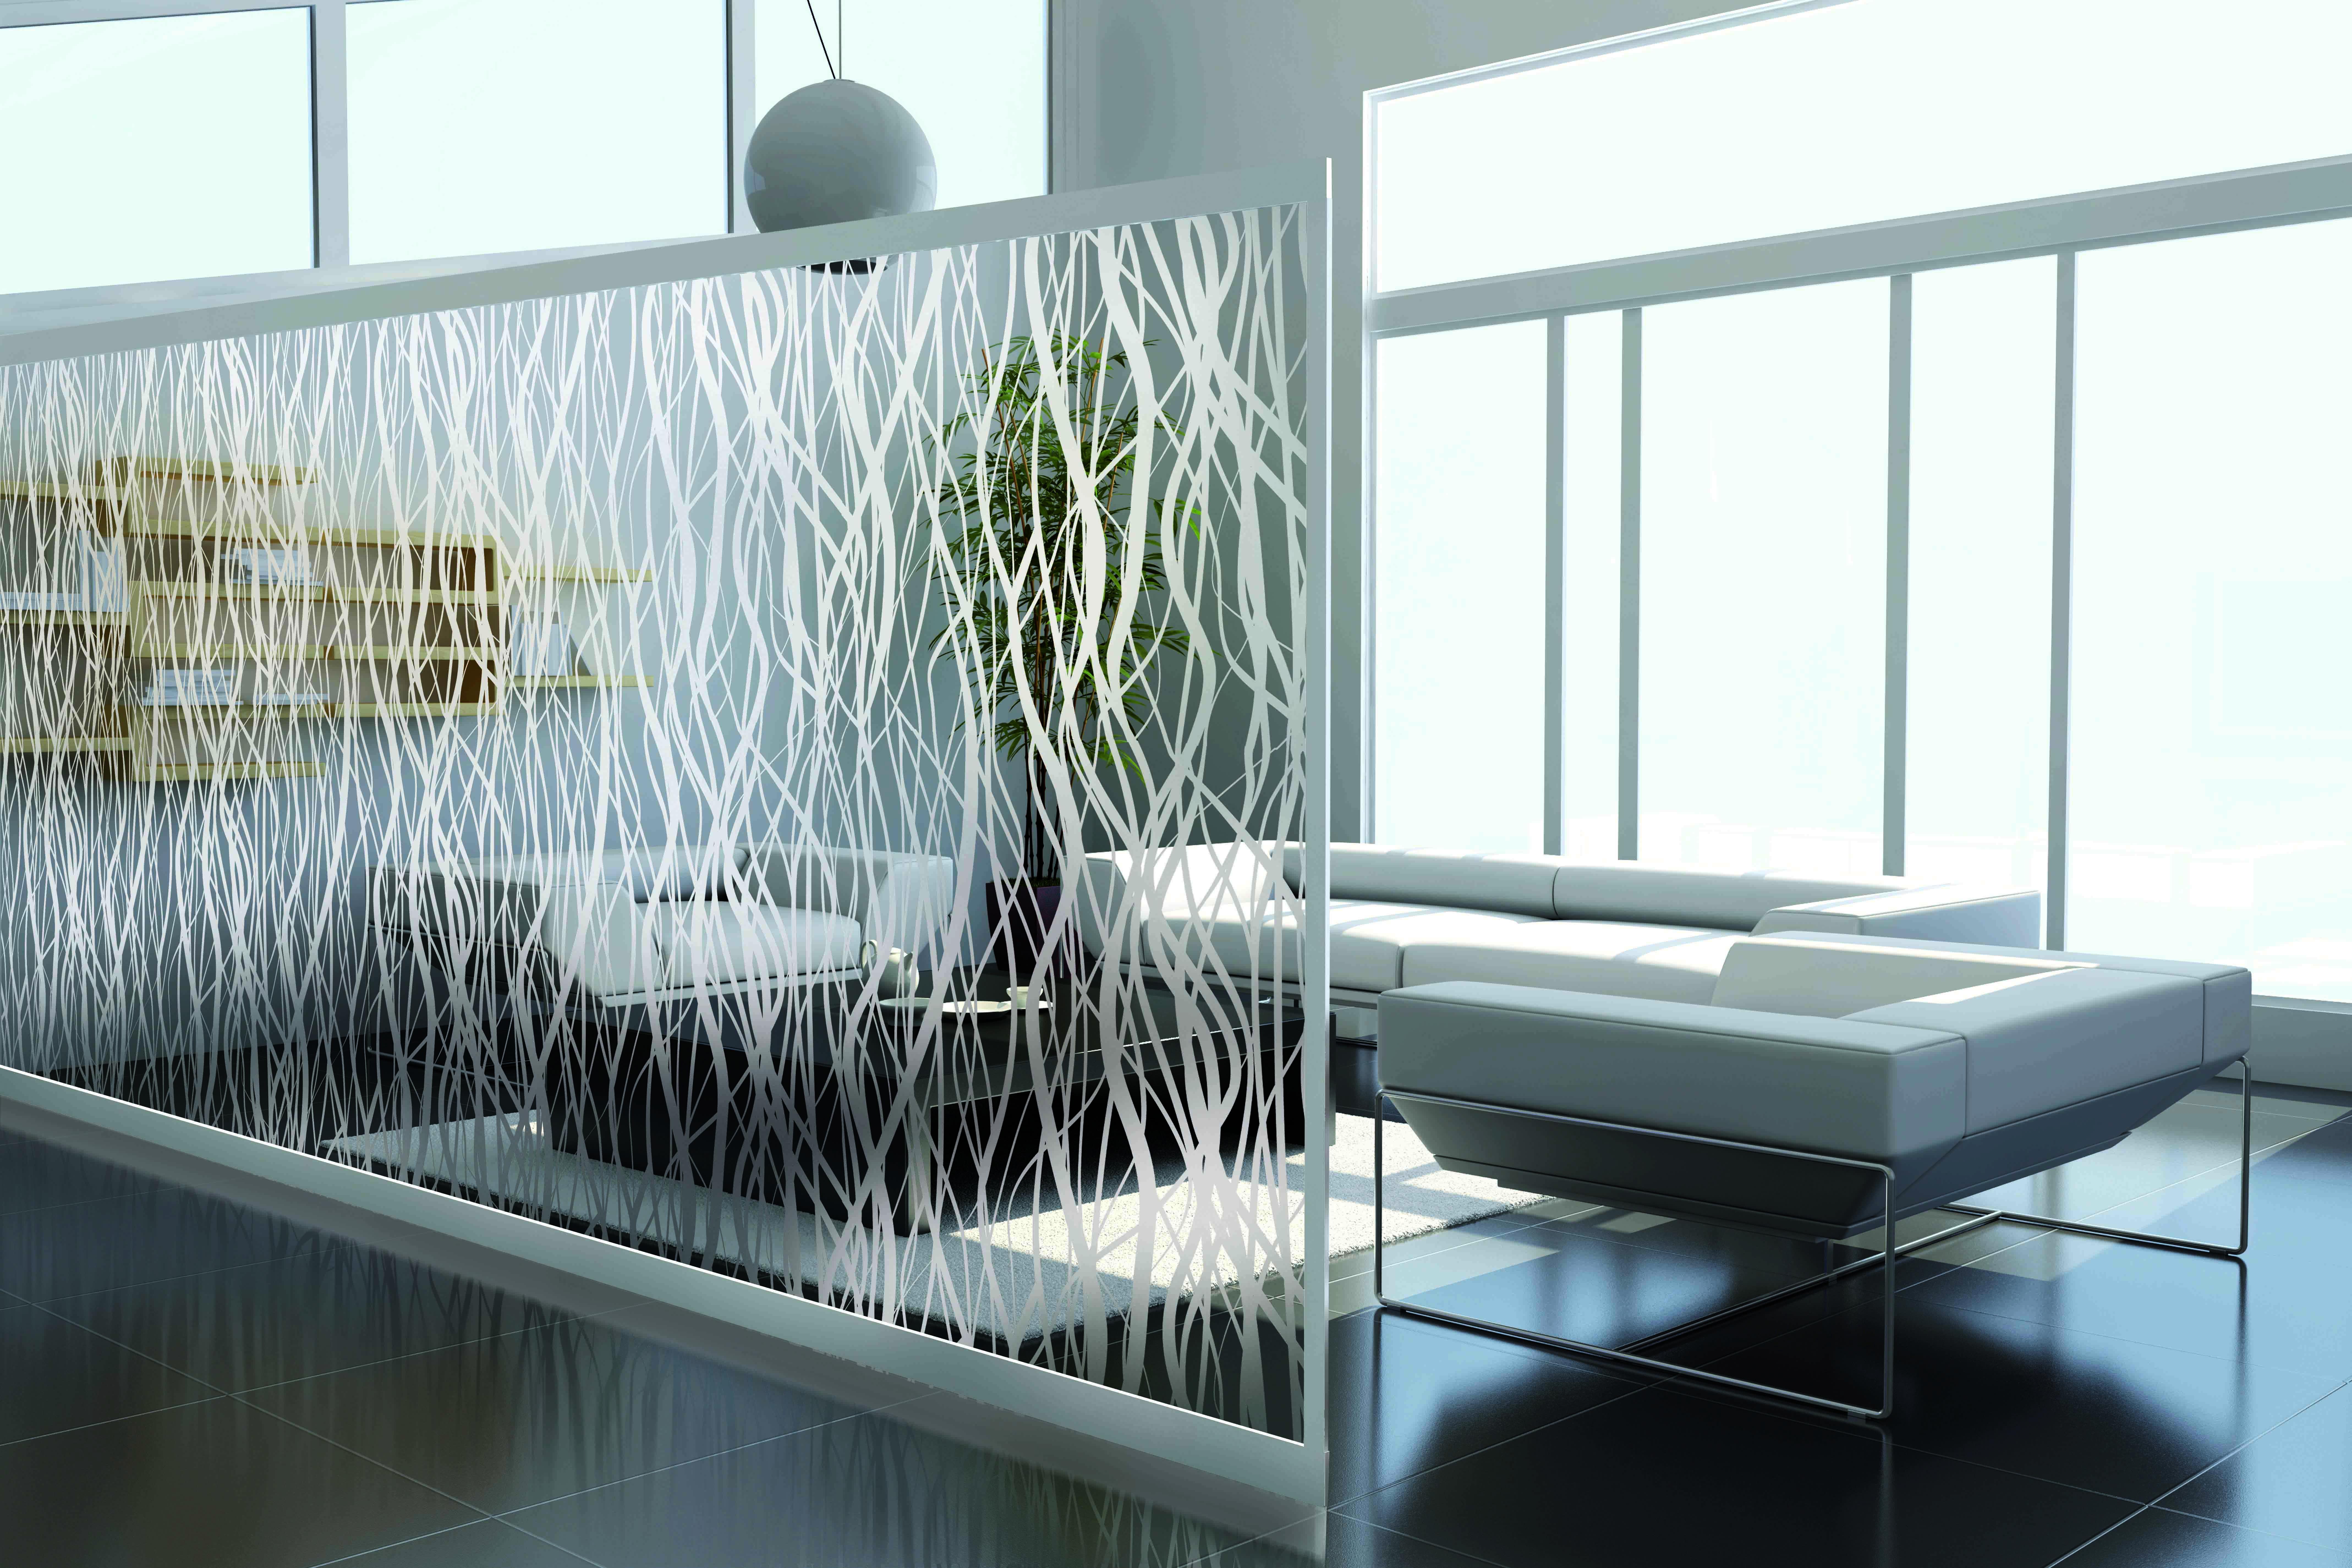 Ru00e9flectiv, adhesivos decorativos para vidrio : Escaparate del Diseu00f1o